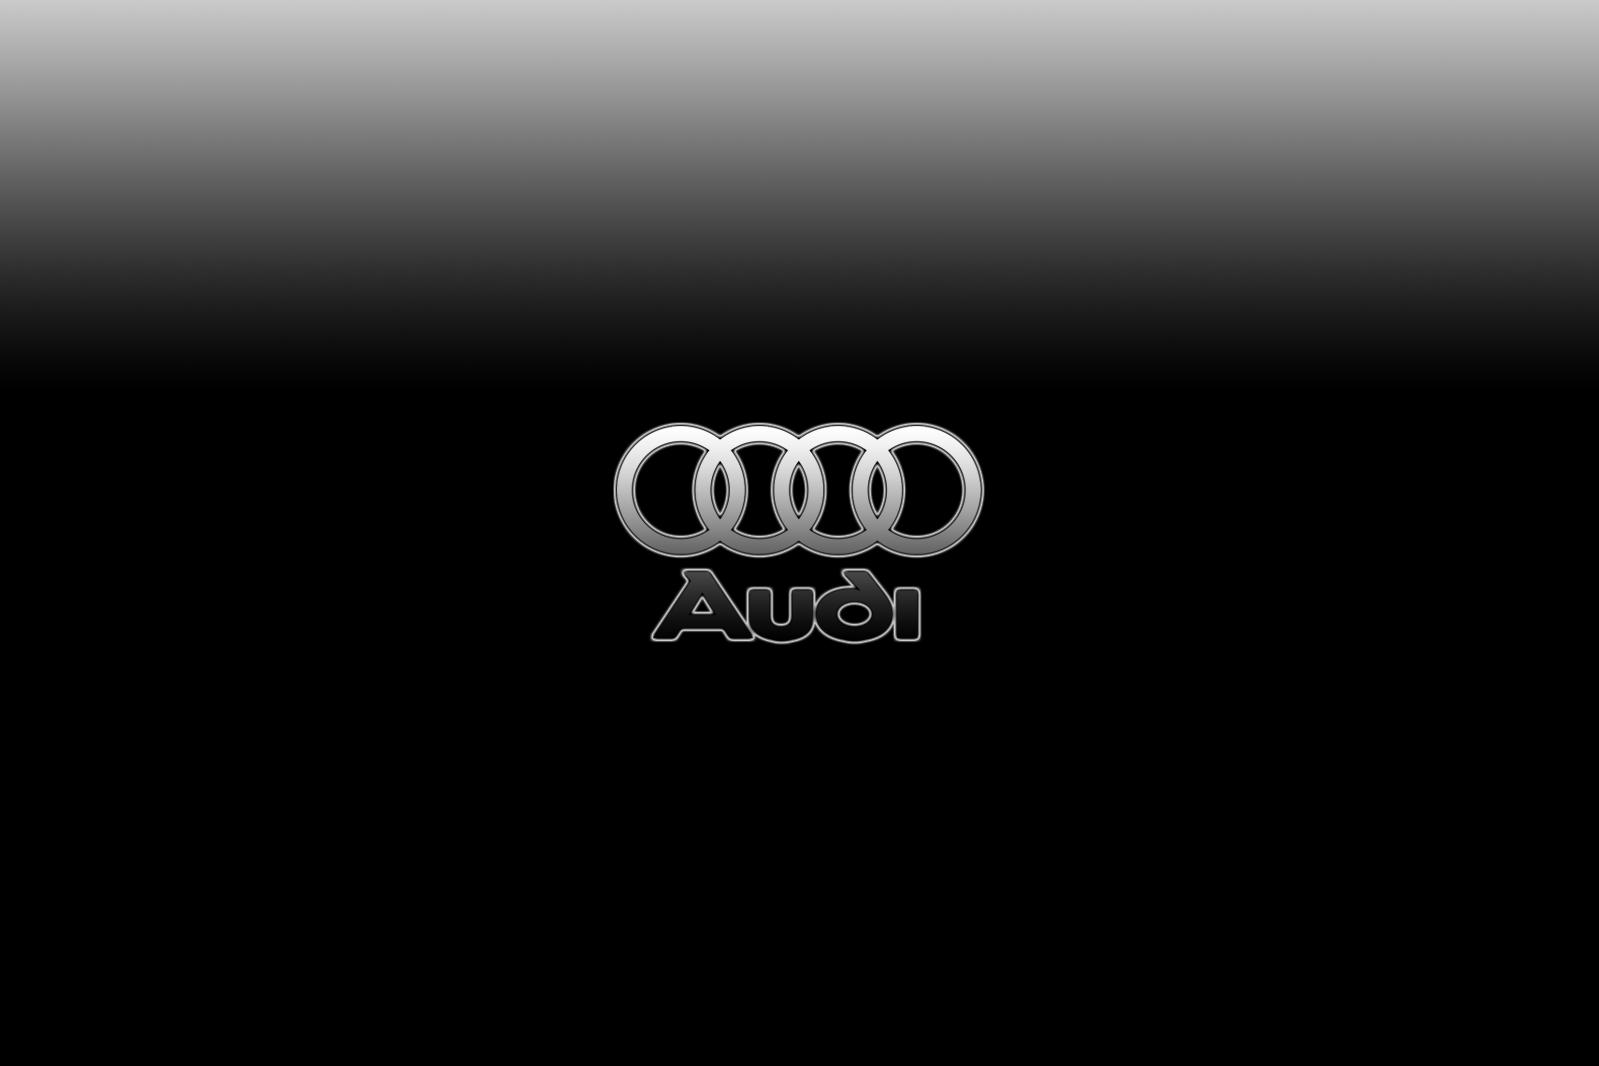 Audi logo wallpapers Audi logo history Audi is a German manufacturer 1599x1066